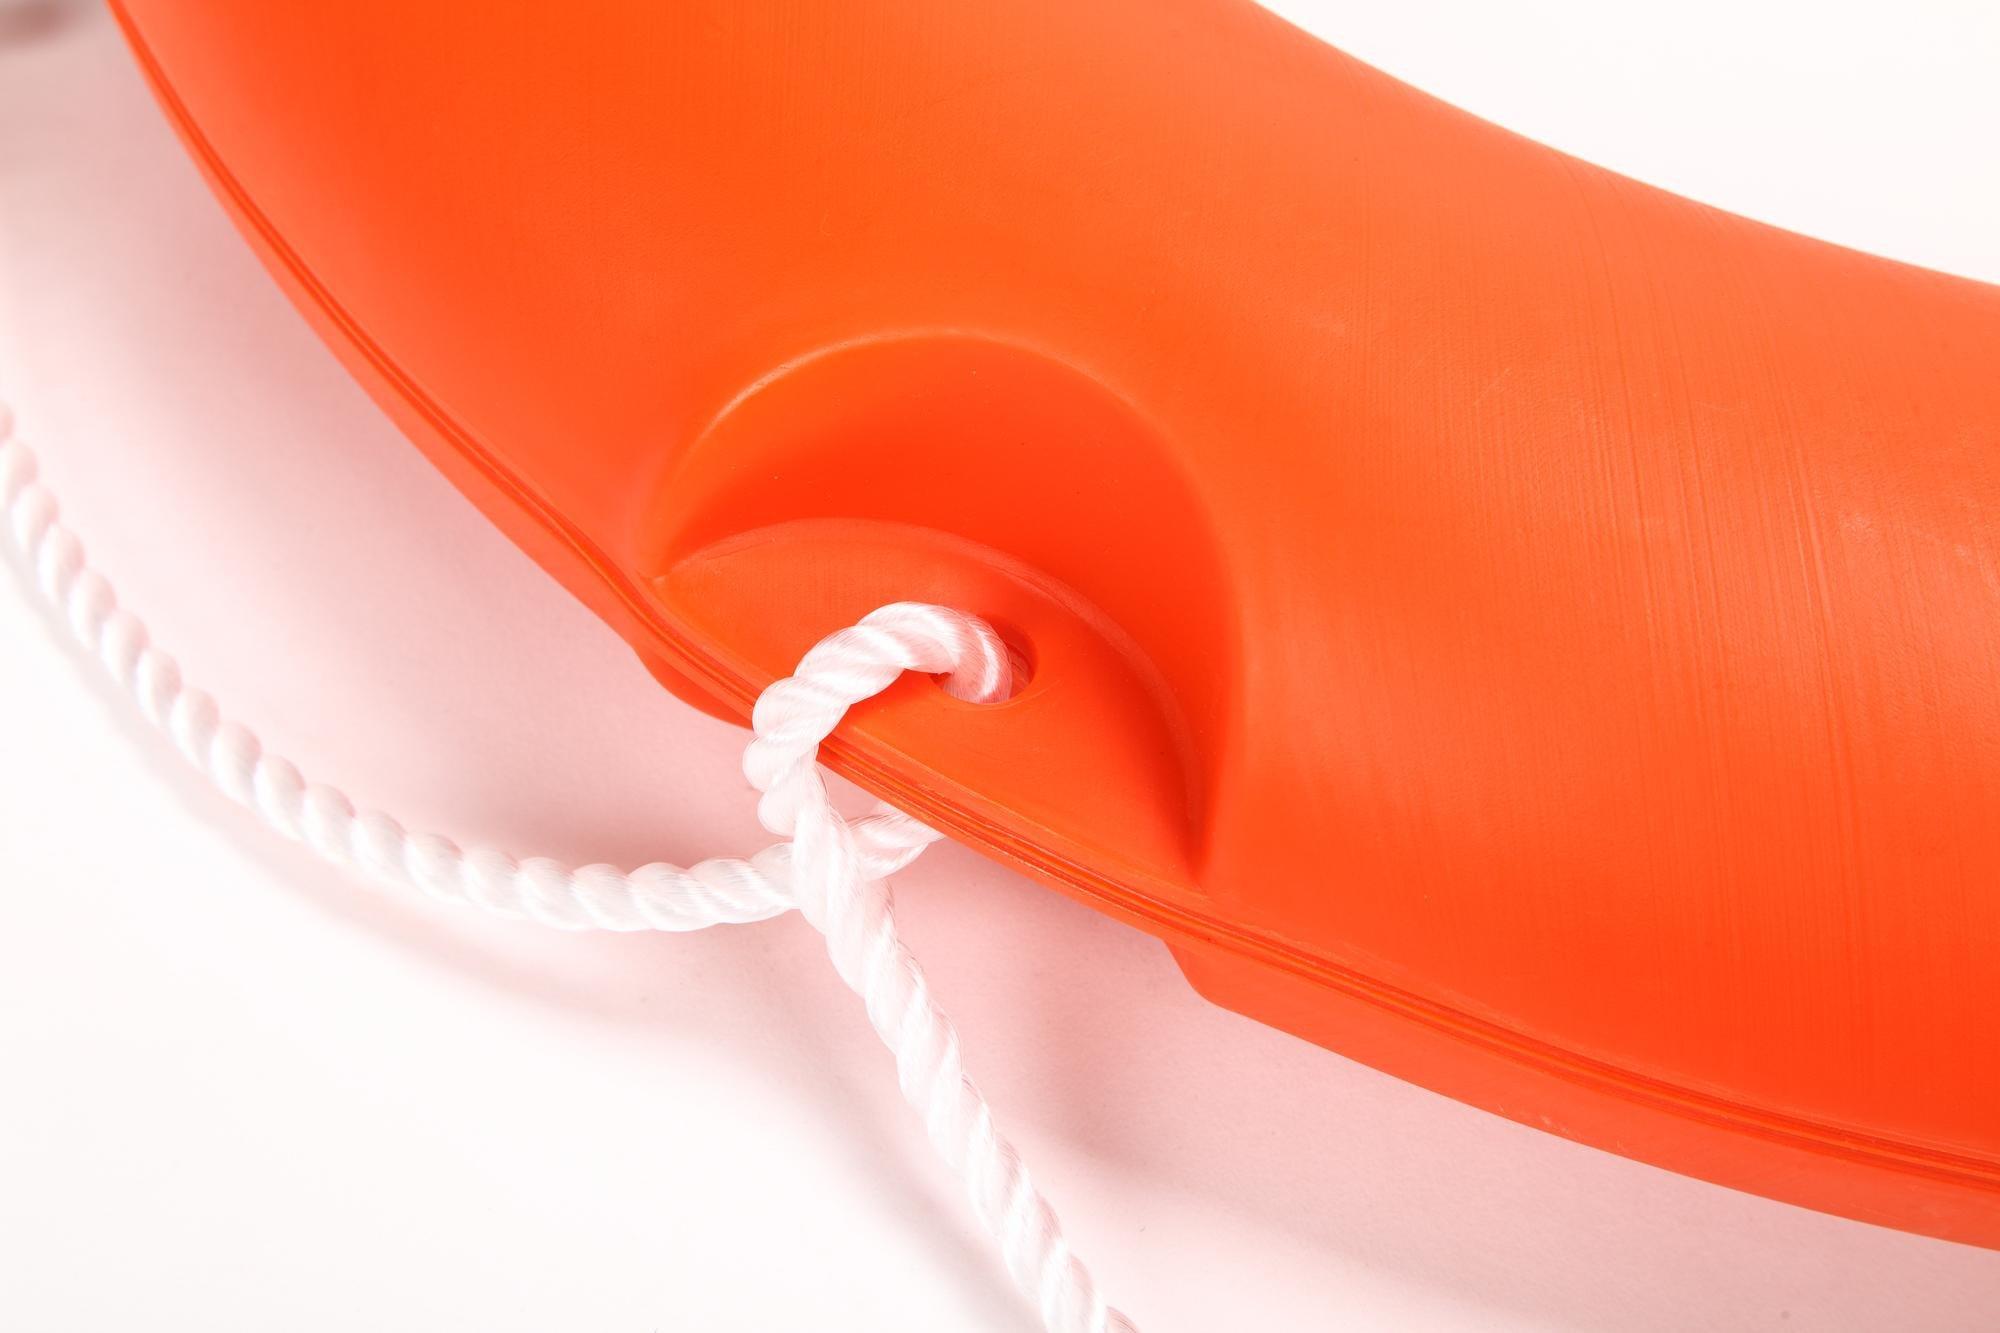 BeautySu. 28'' Diameter Professional Adult Foam Swim Ring Buoy Orange Lifering with White Bands by BeautySu. (Image #8)